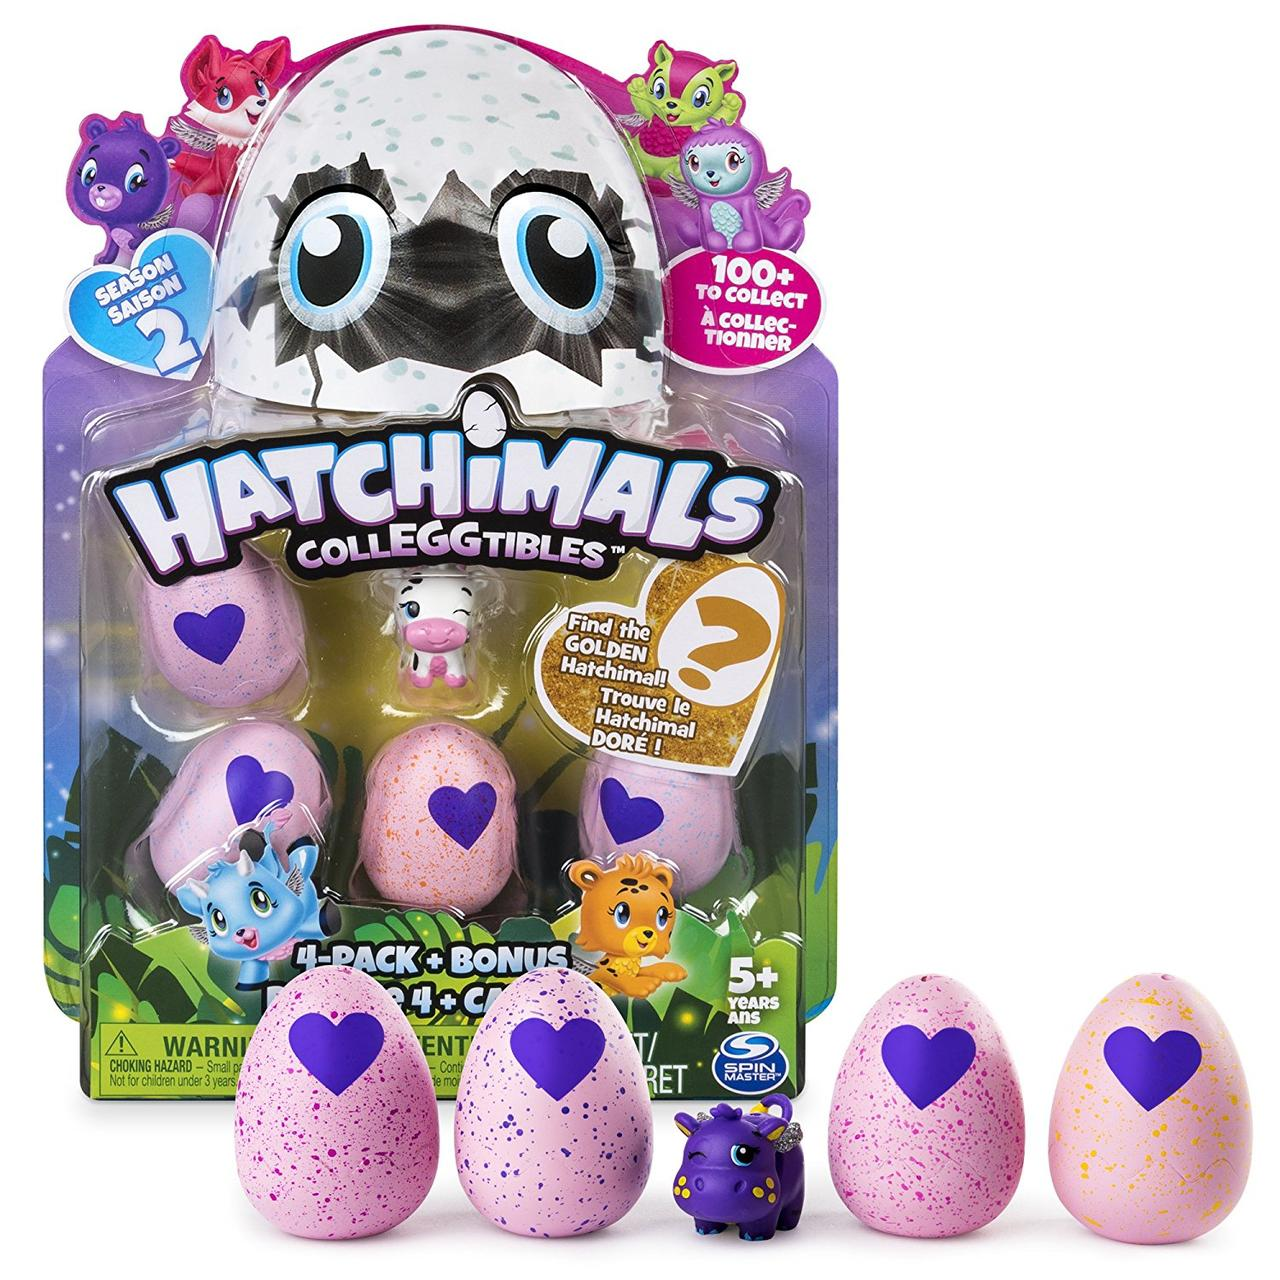 Hatchimals CollEGGtibles Набор Яйца Хатчималс 4 шт + бонусная фигурка, сезон 2, Spin Master из США